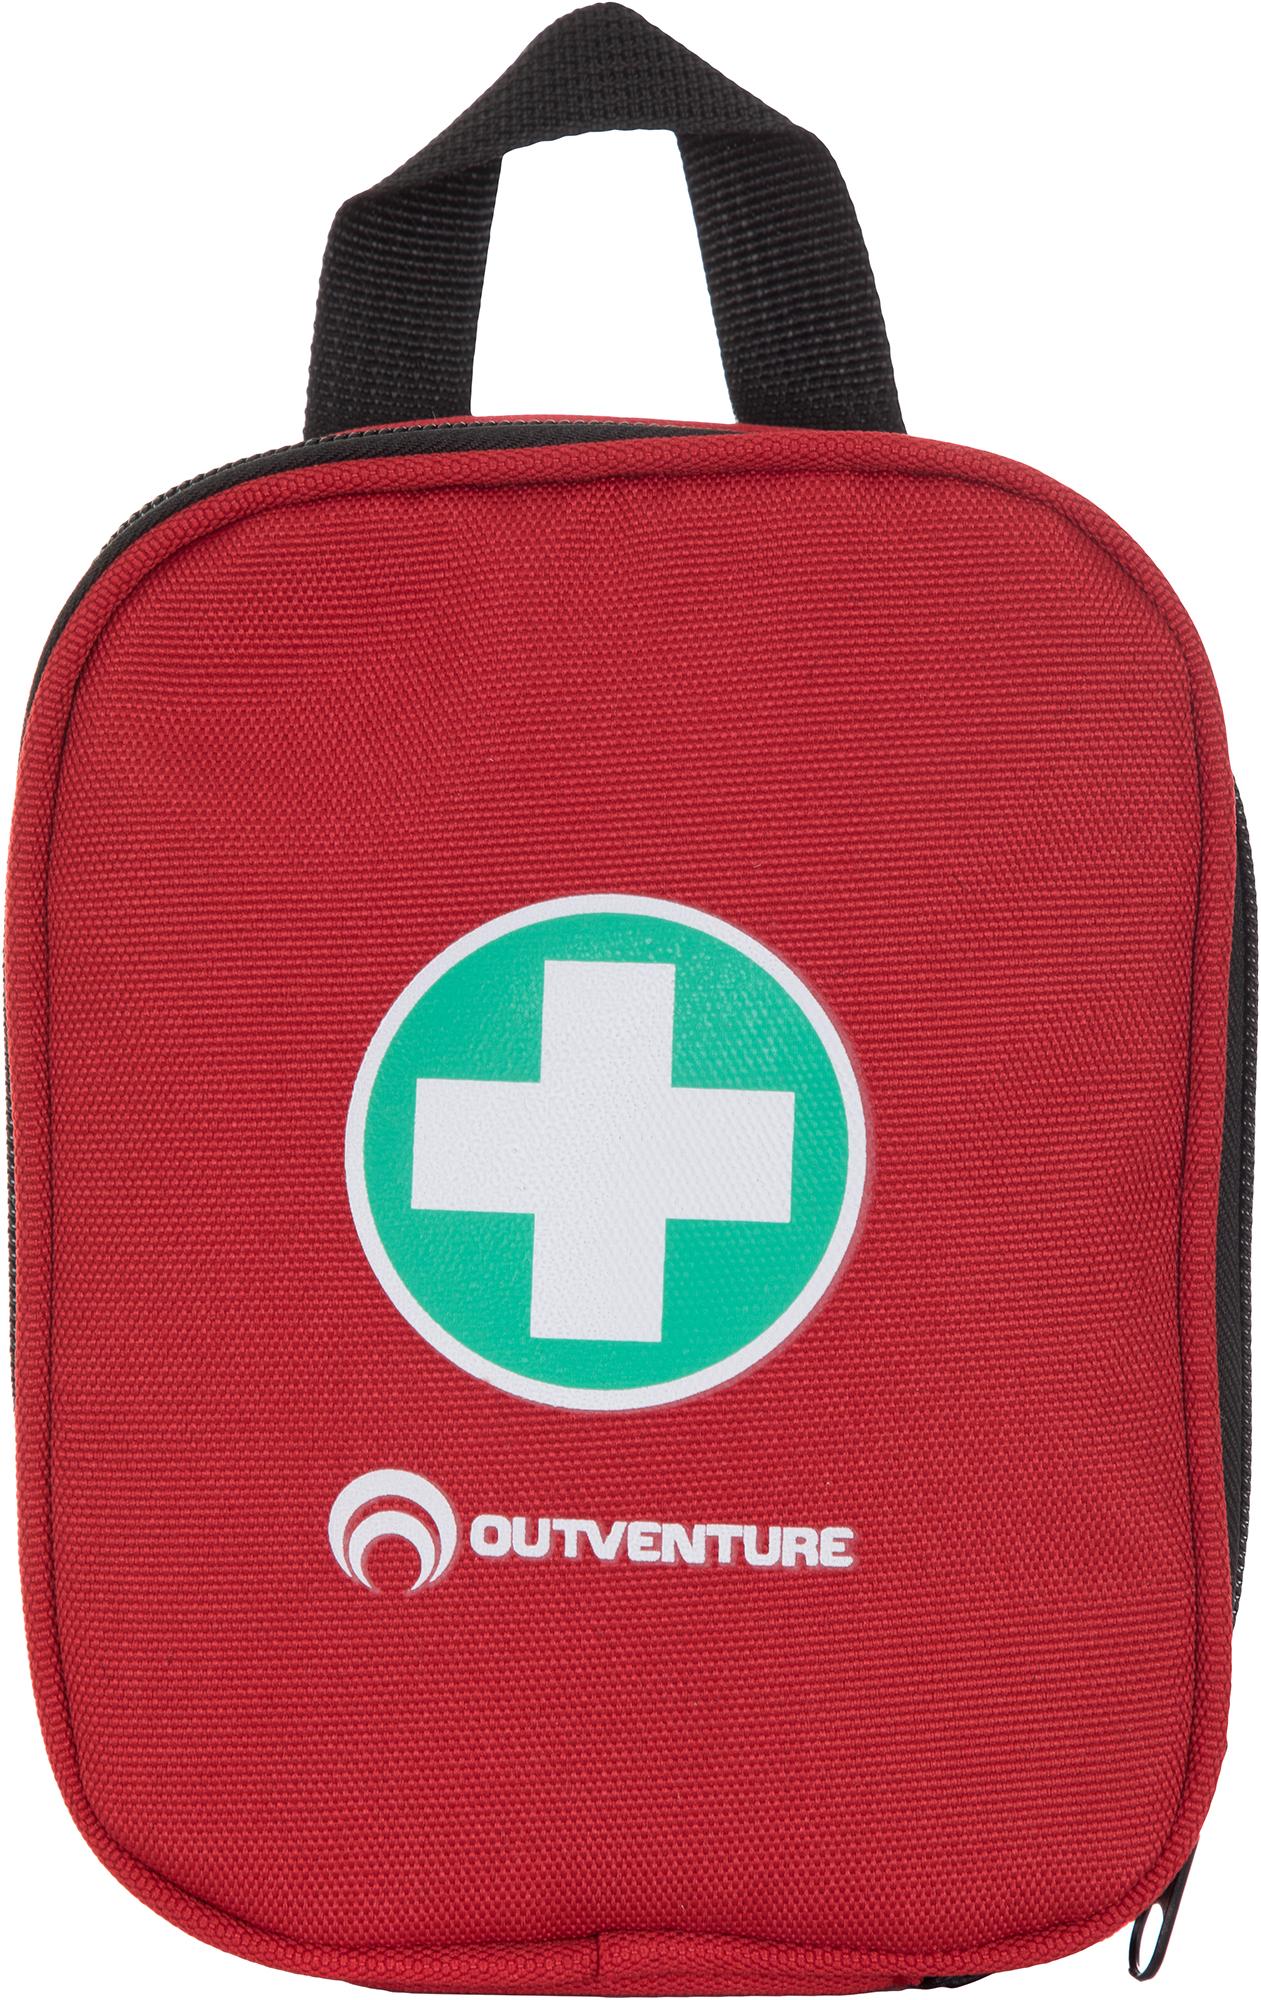 Outventure Сумка для медикаментов Outventure